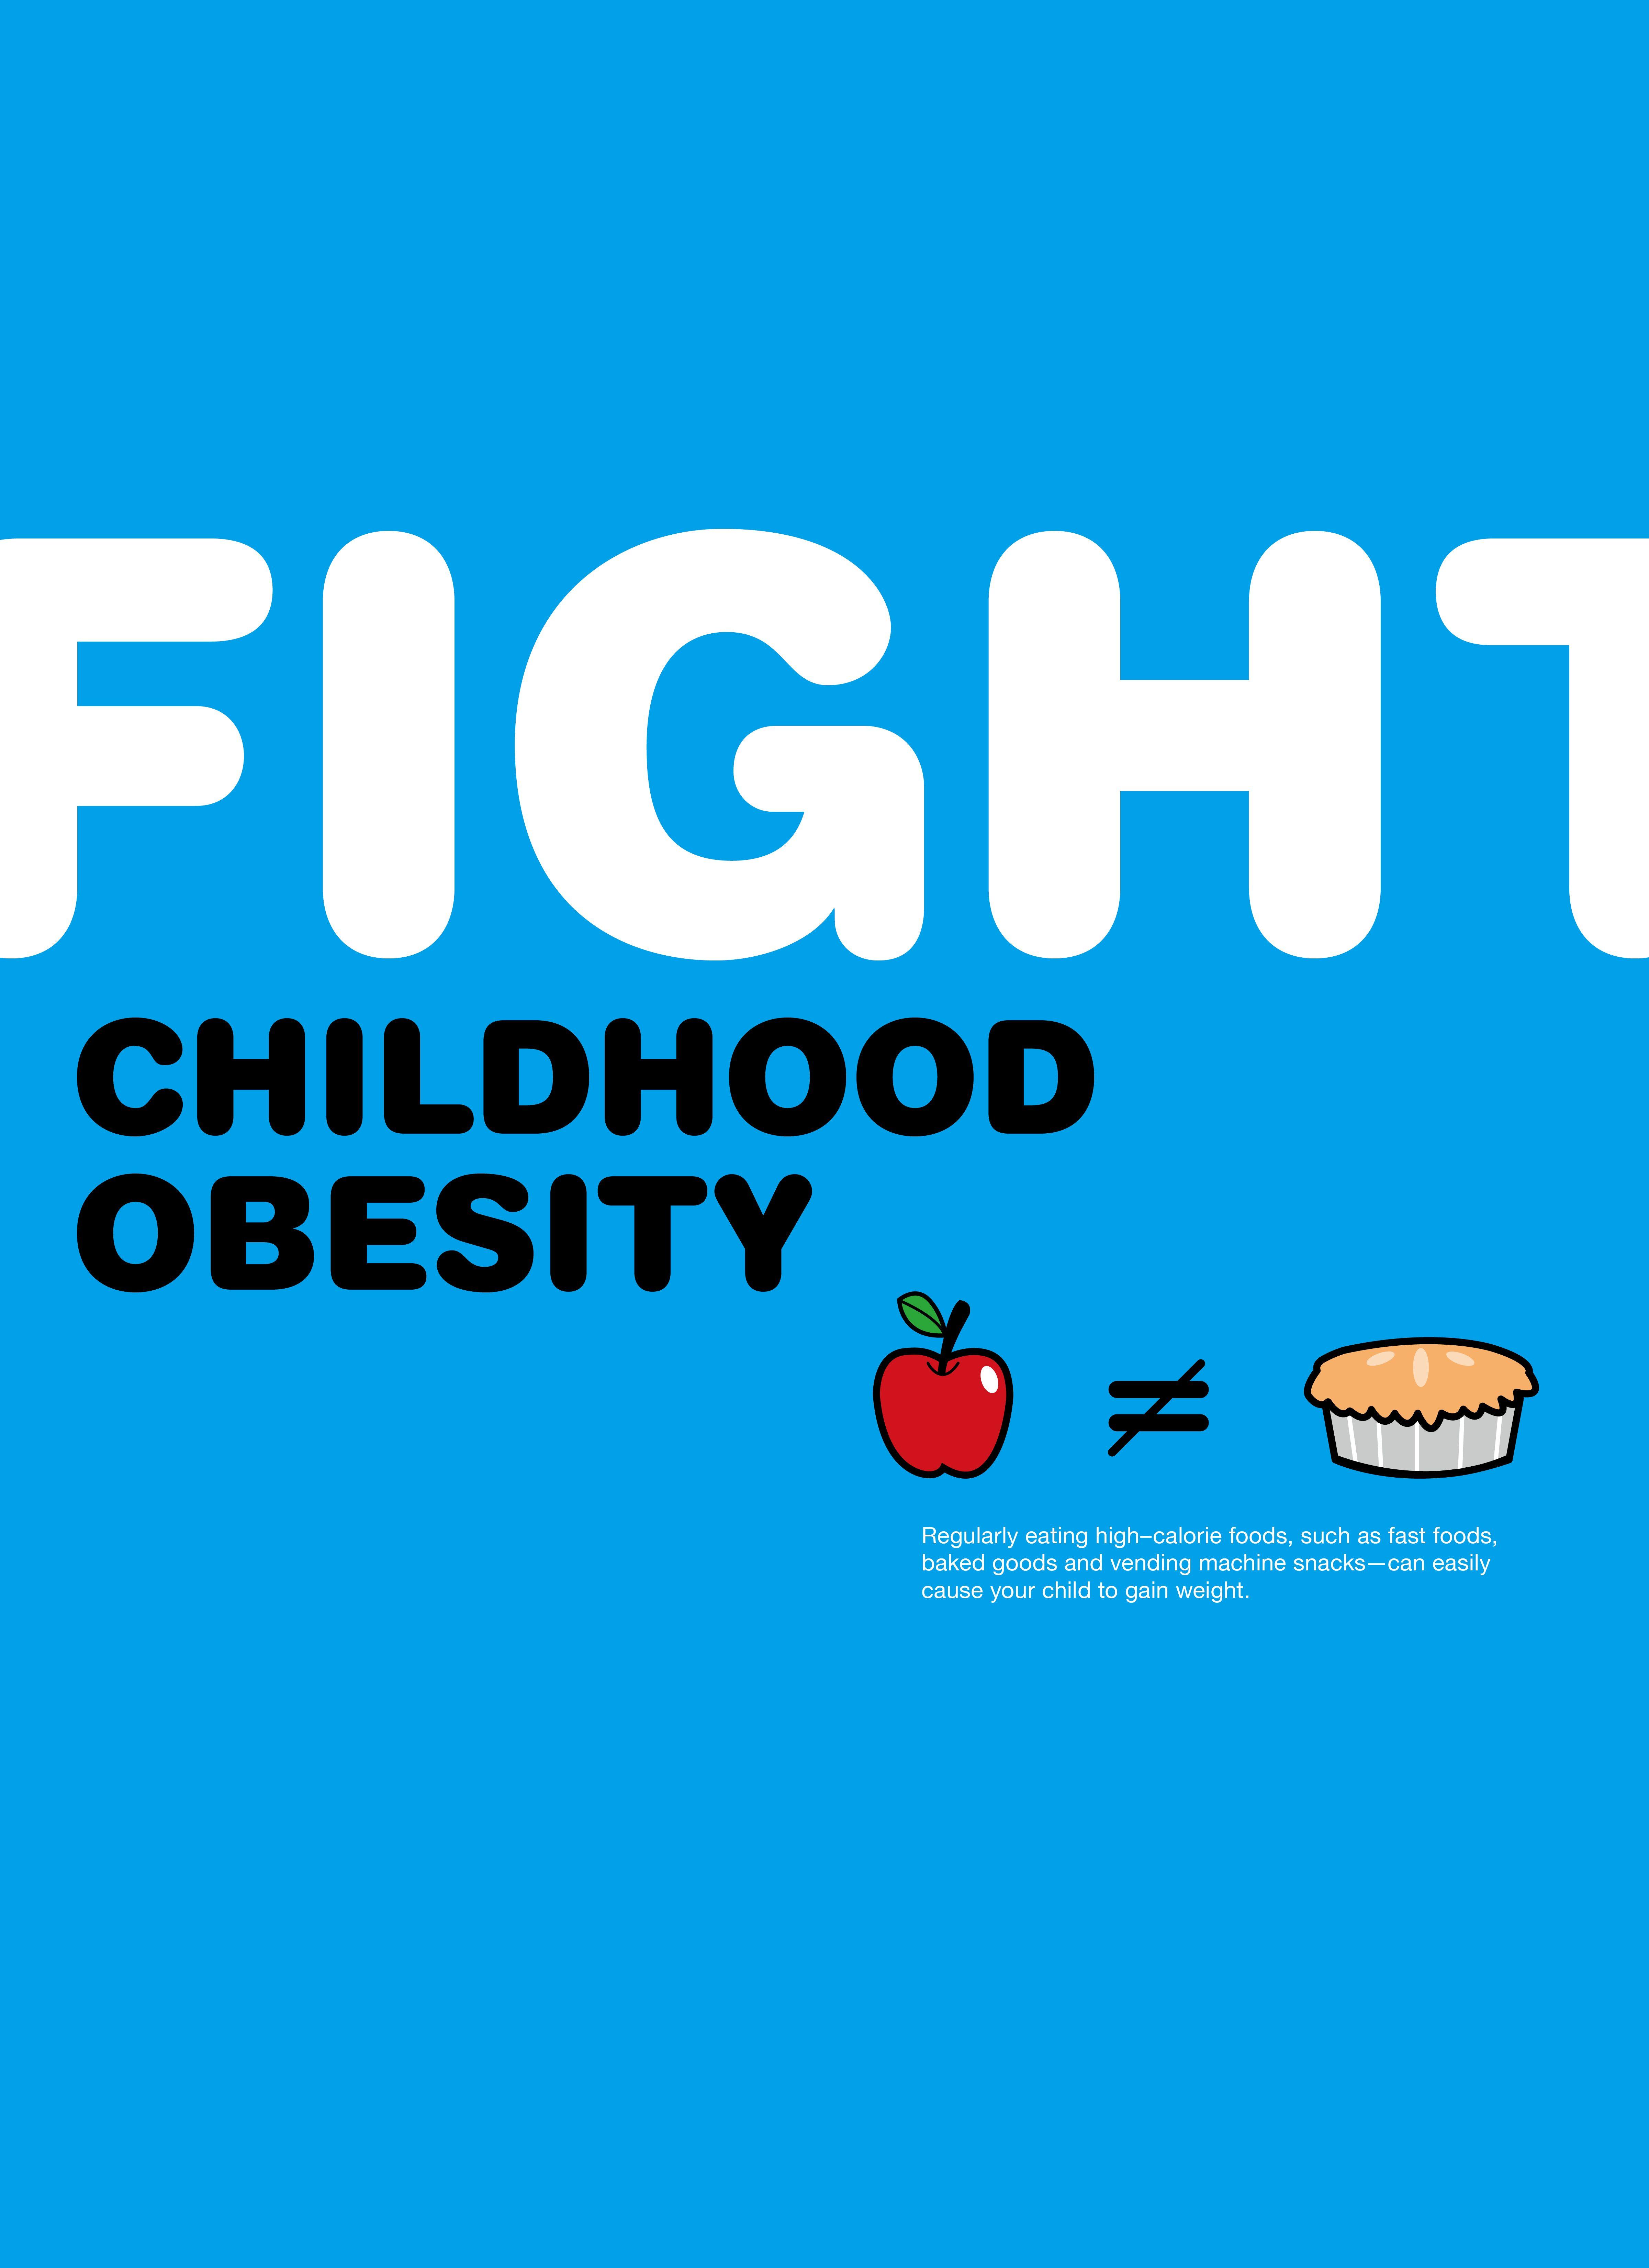 children obesity poster copy poster in 2018 pinterest